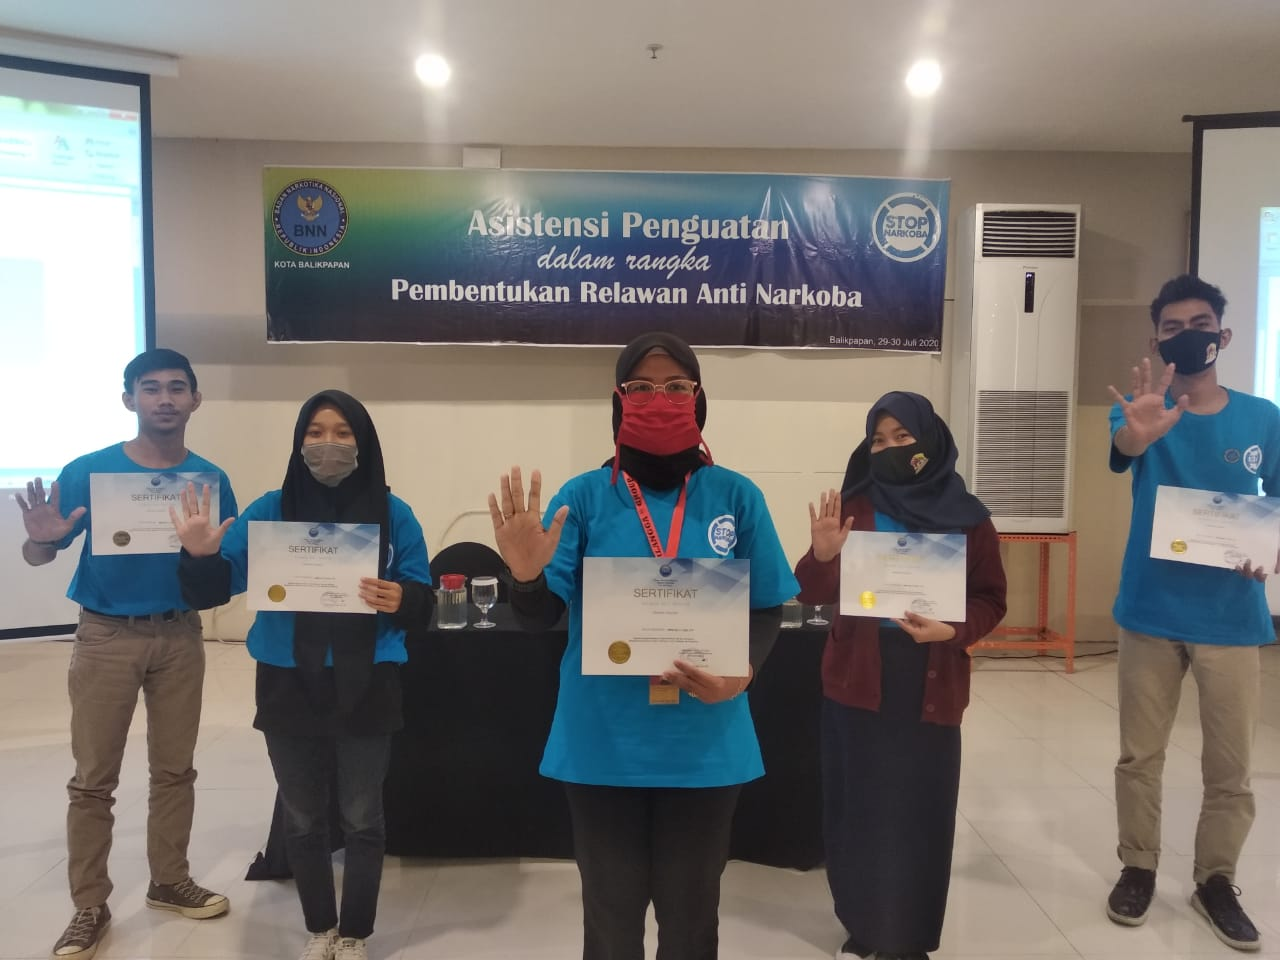 Peserta yang telah mengikuti agenda tersebut mendapatkan sertifikat sebagai bukti keikutsertaan dalam Pembentukan Relawan Anti Narkoba.